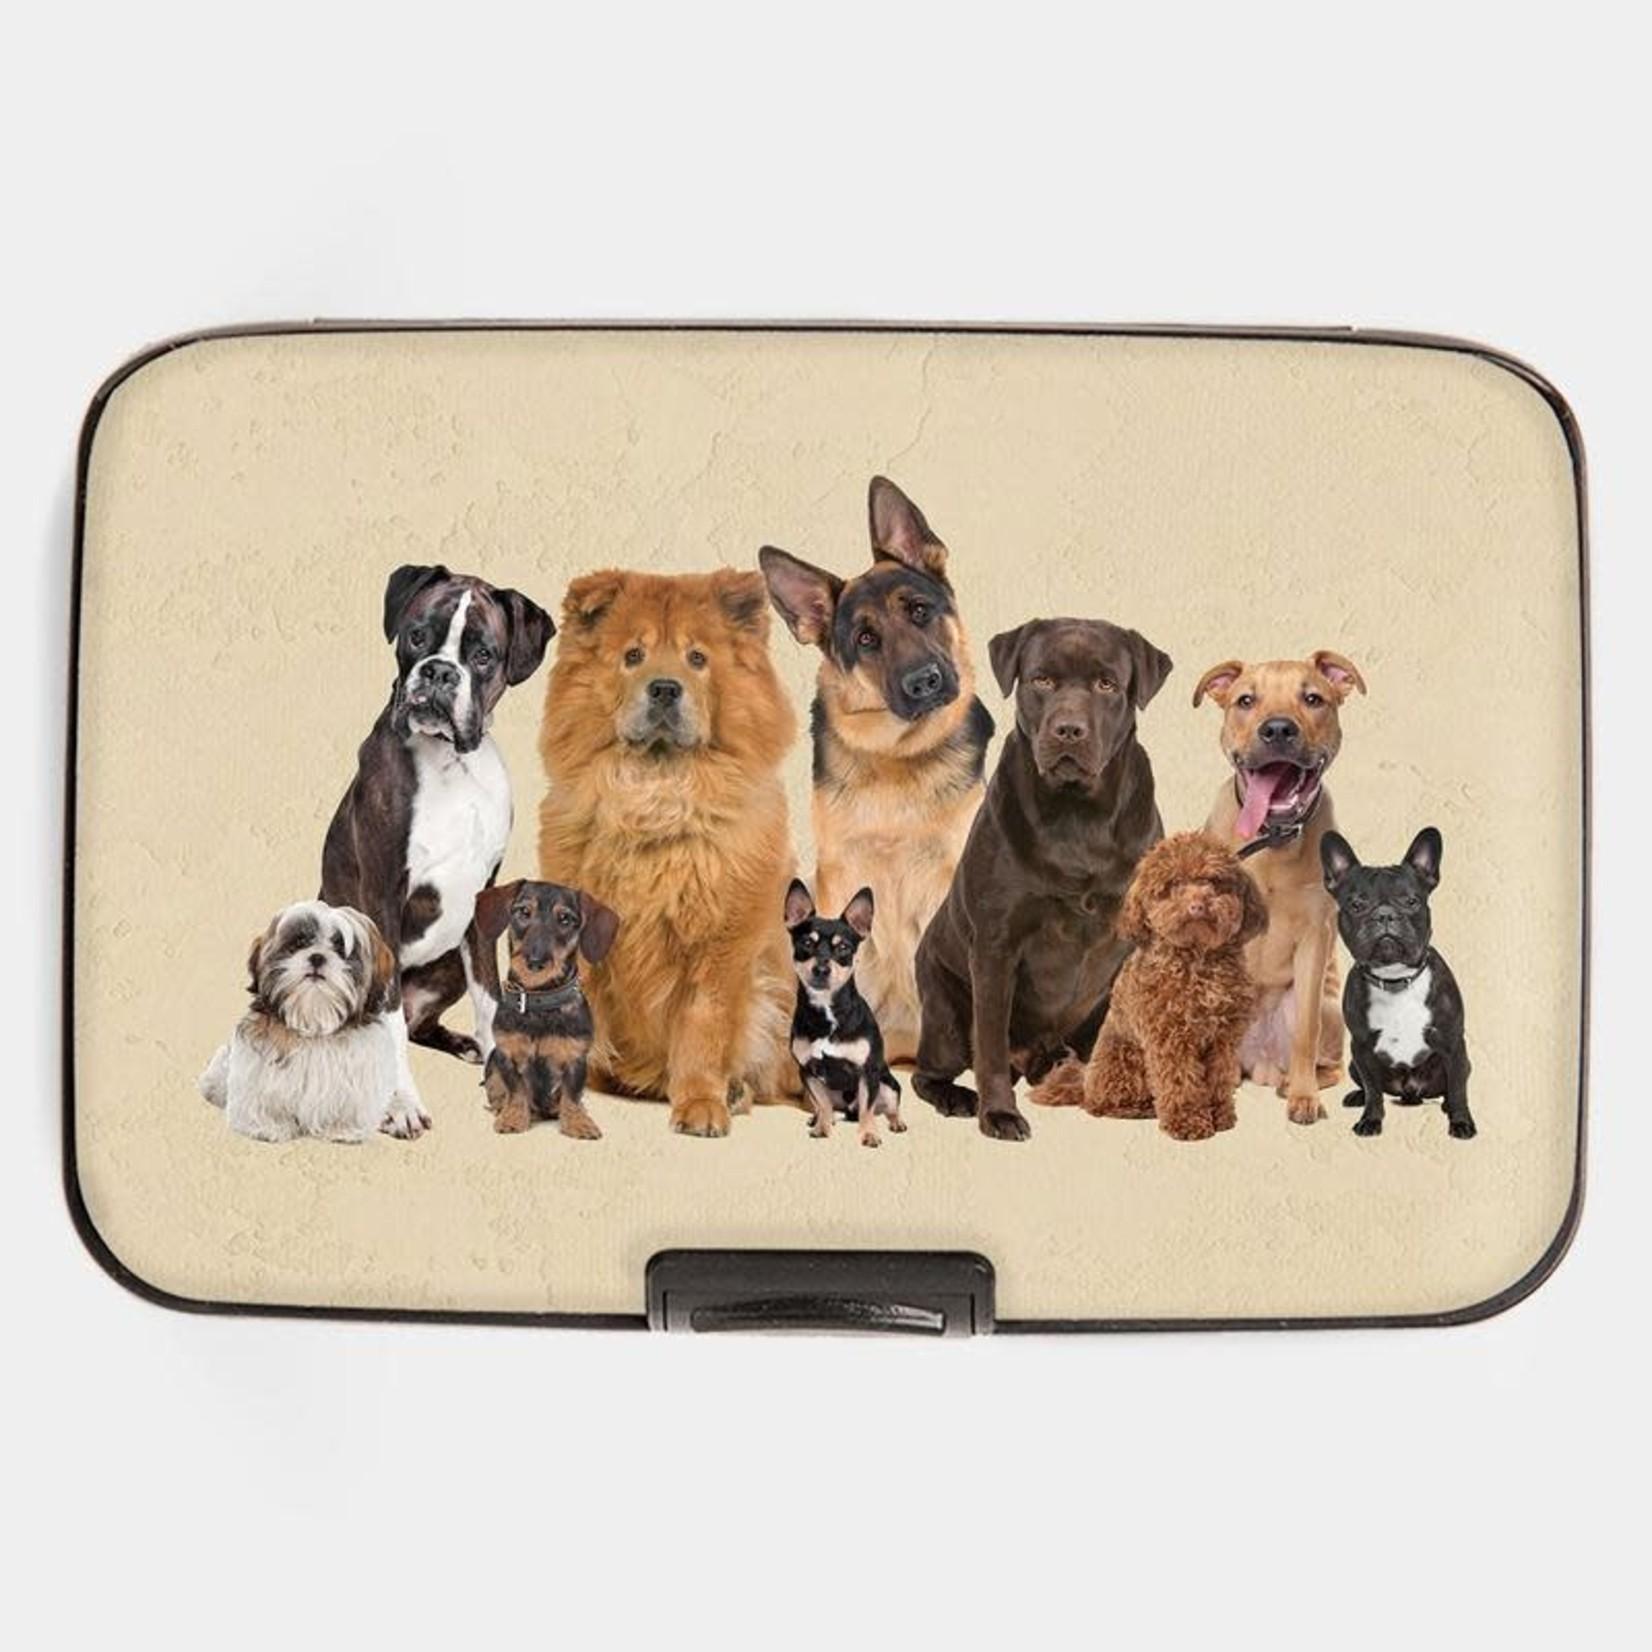 Monarque Armored Wallet - Dog Breeds